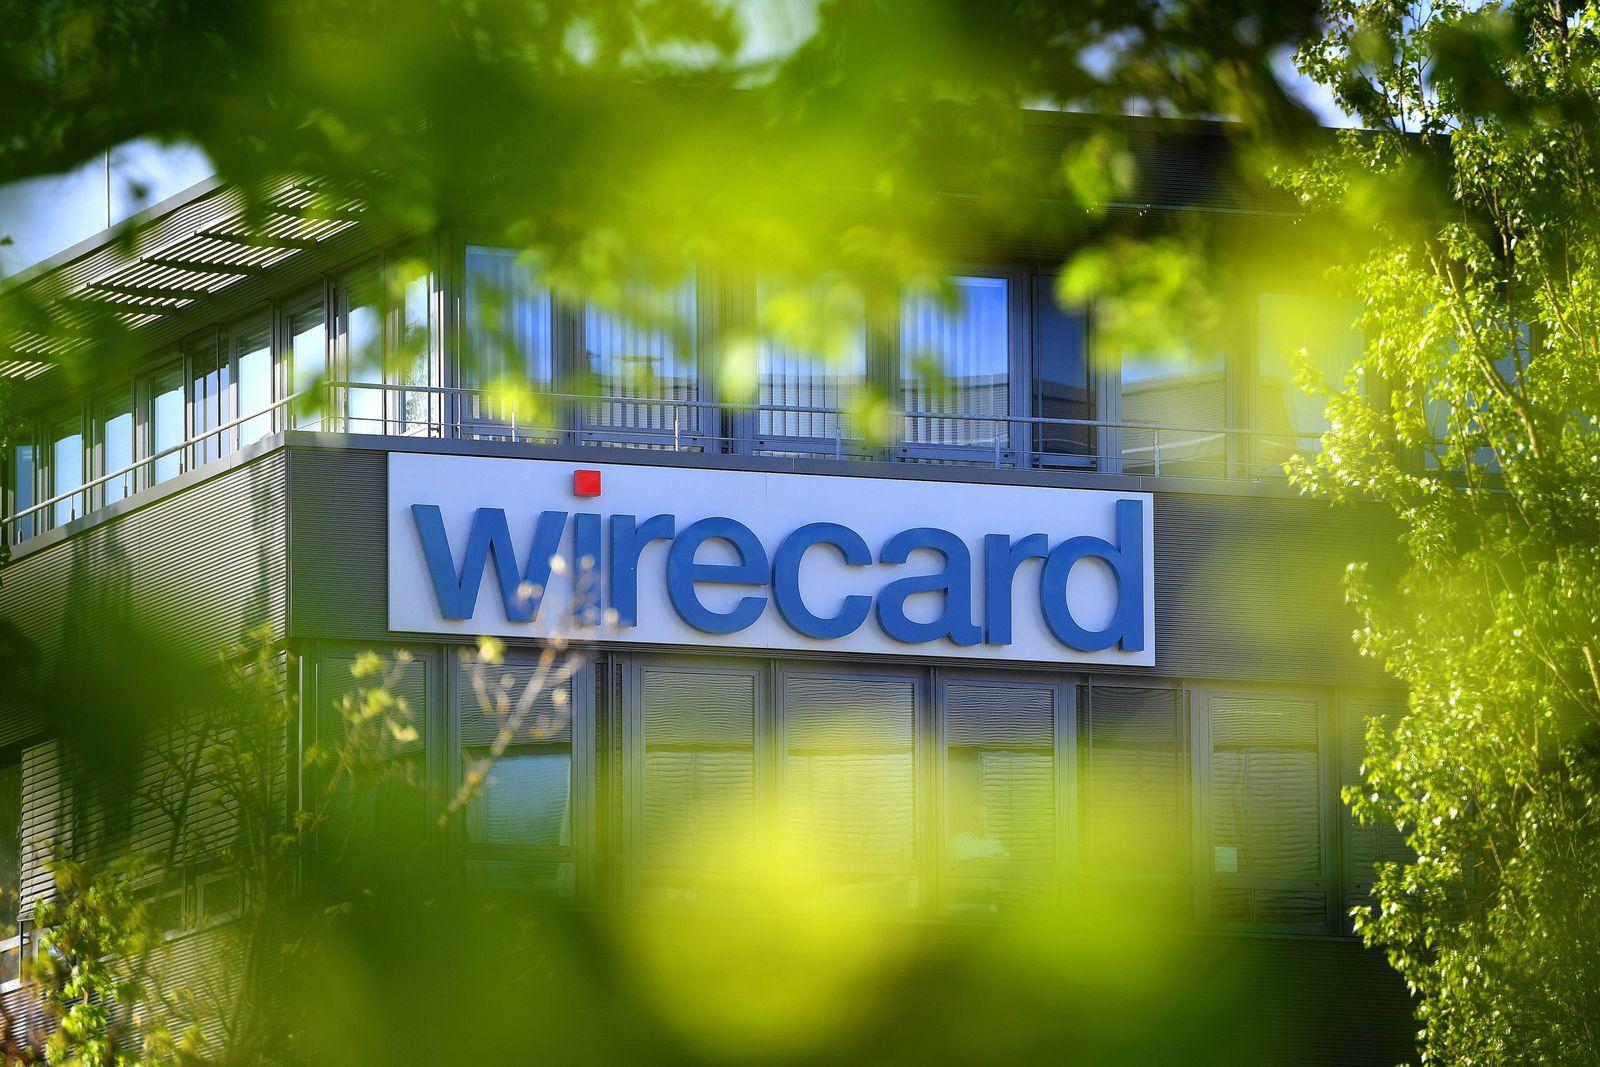 wirecard Logo Firmenemblem Schriftzug Gebaeude Fassade Sitz in Aschheim Dornach Bilanzpressekonf